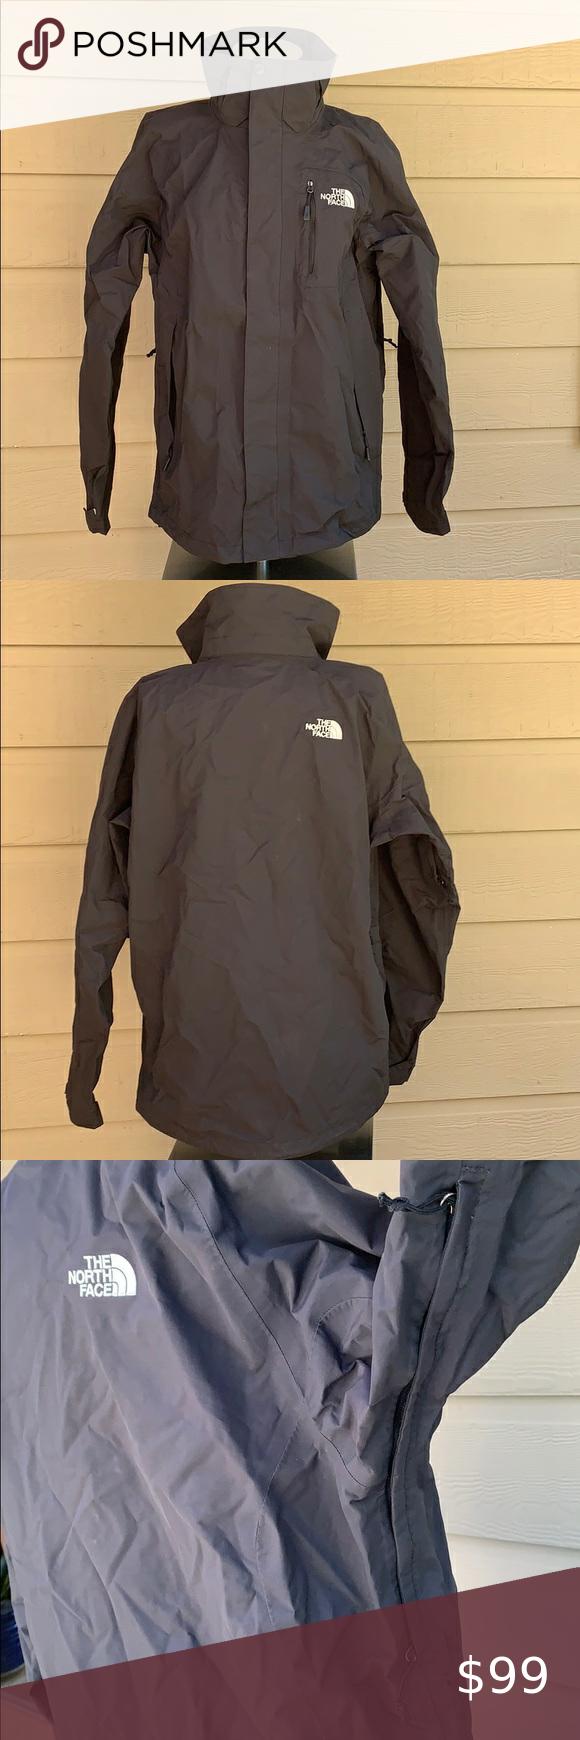 The North Face Black Ski Jacket Men S Small Black Ski Jacket Black North Face Ski Jacket [ 1740 x 580 Pixel ]